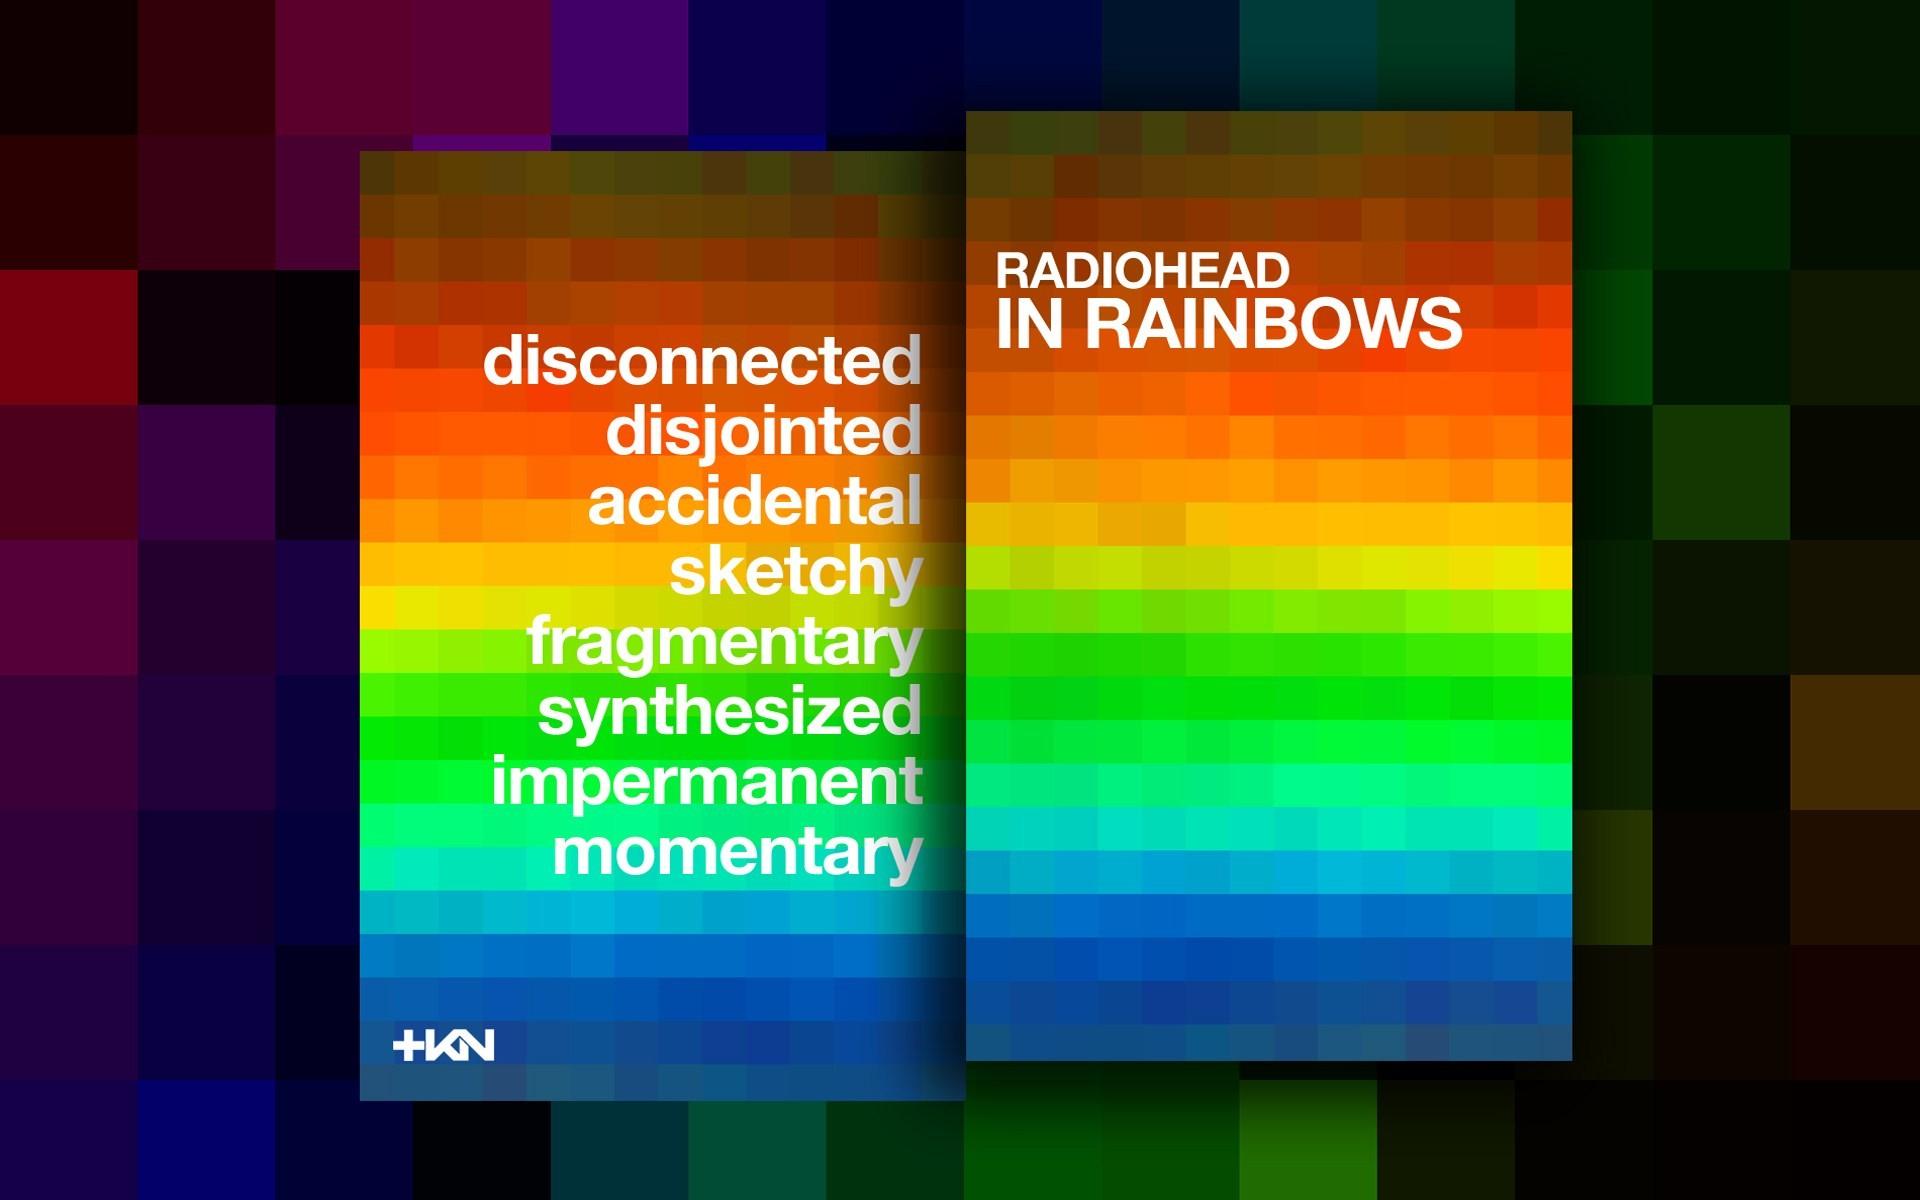 Radiohead Countdown Wallpaper: #7 of 7 In Rainbows